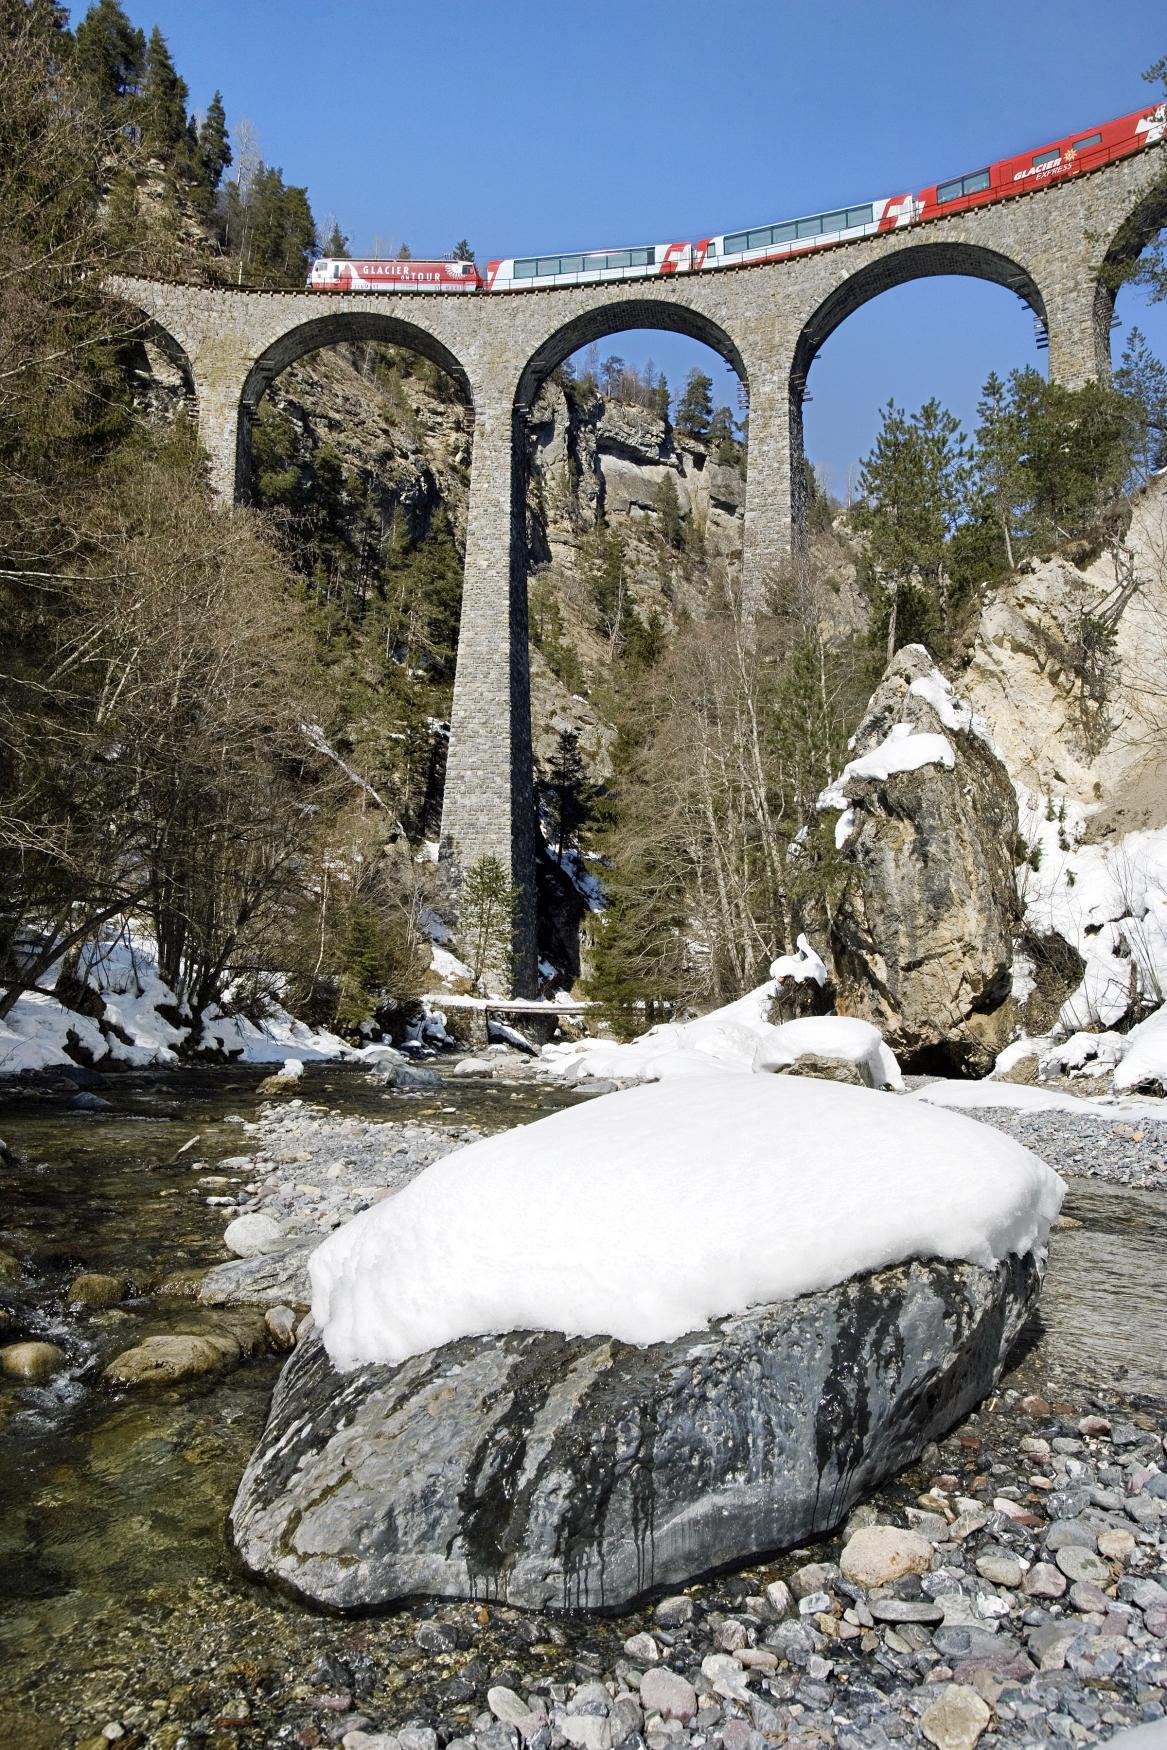 Glacier Express na viaduktu Landwasser